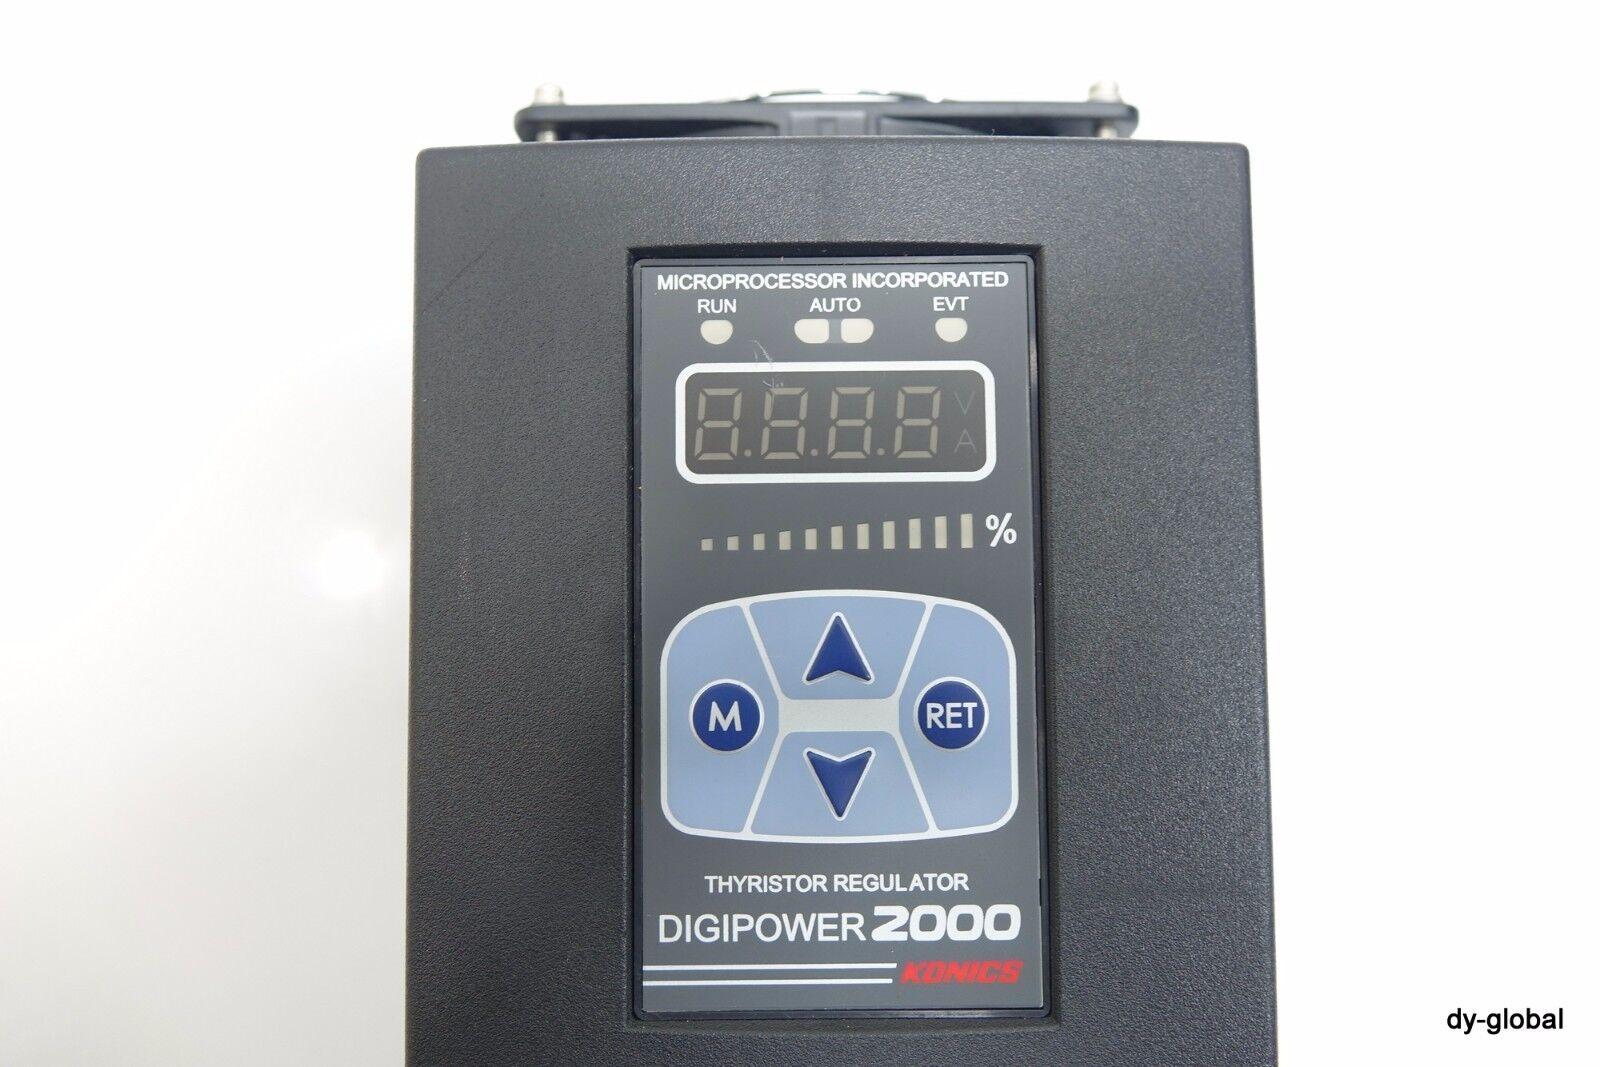 KONICS DPU-14B 440V 100A DIGIPOWER 2000 THYRISTOR REGULATOR ELEC-I-105@10